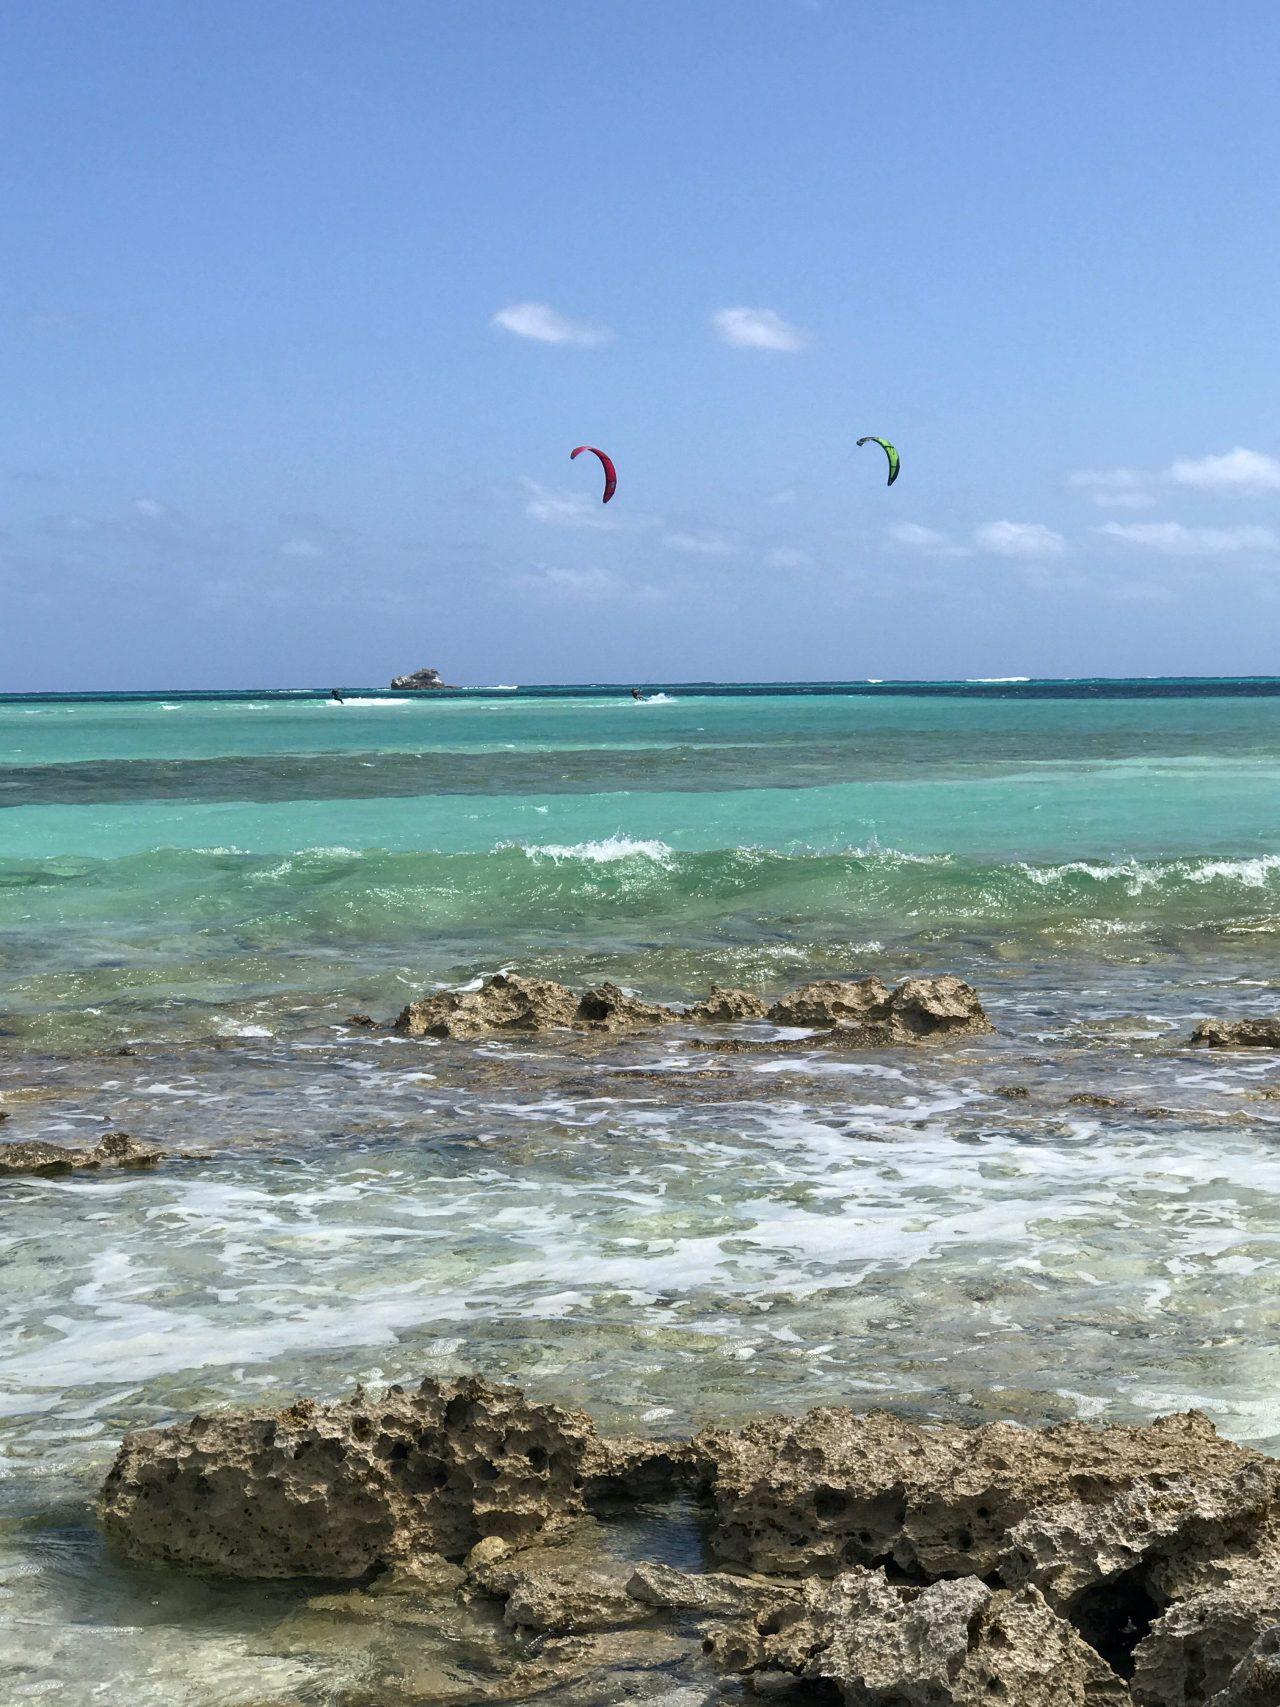 kite urlaub bahamas san salvador kitesurfen